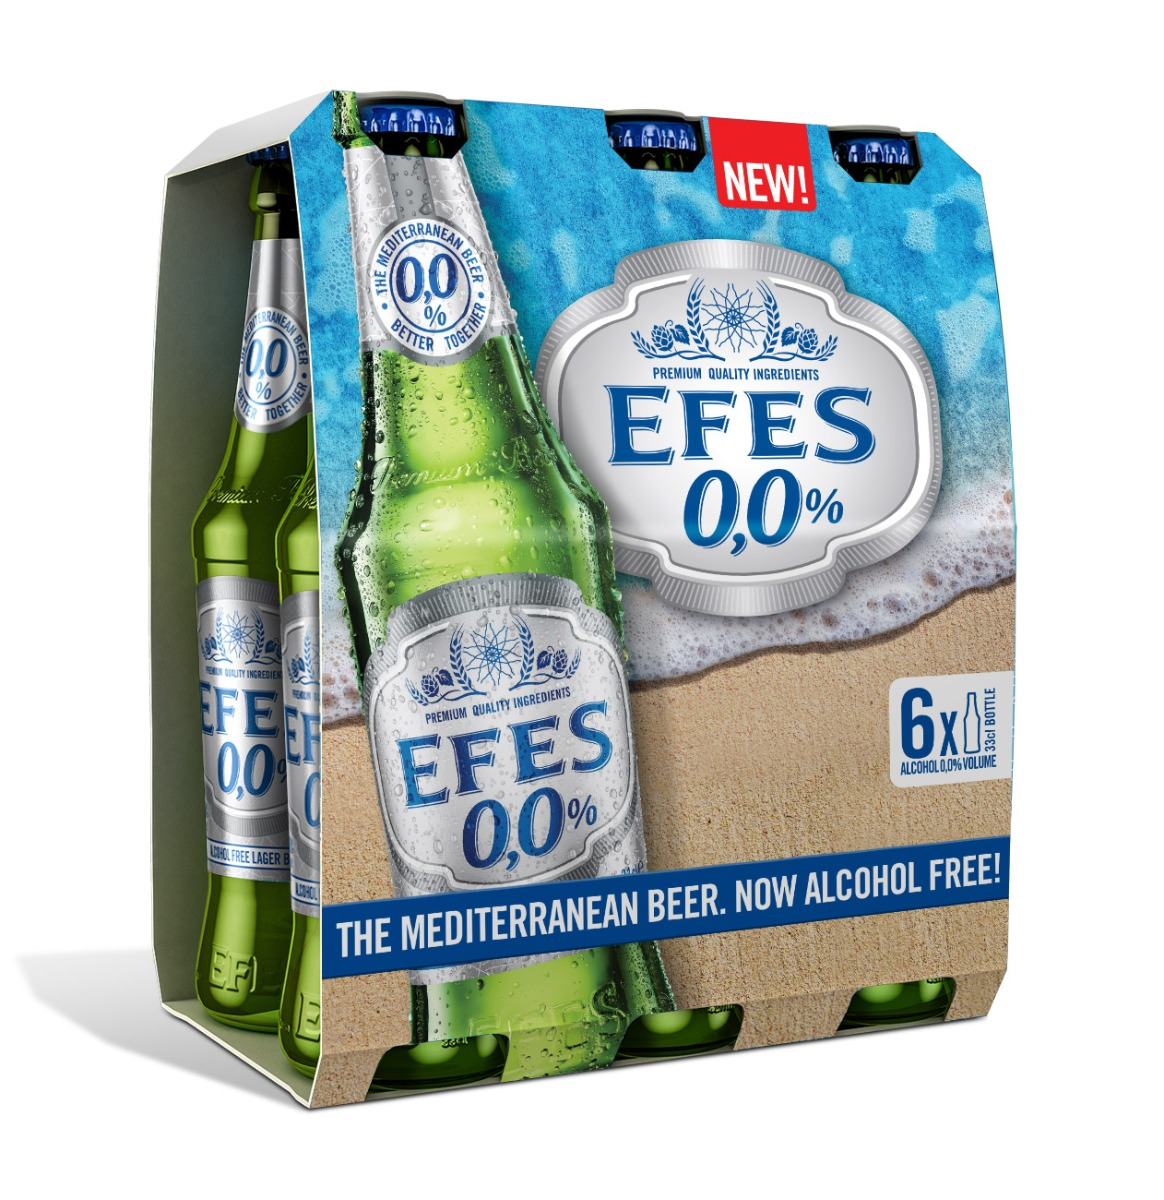 EFES NON ALCOHOL BEER IN BOTTLES [24X33CL]  @1CASE